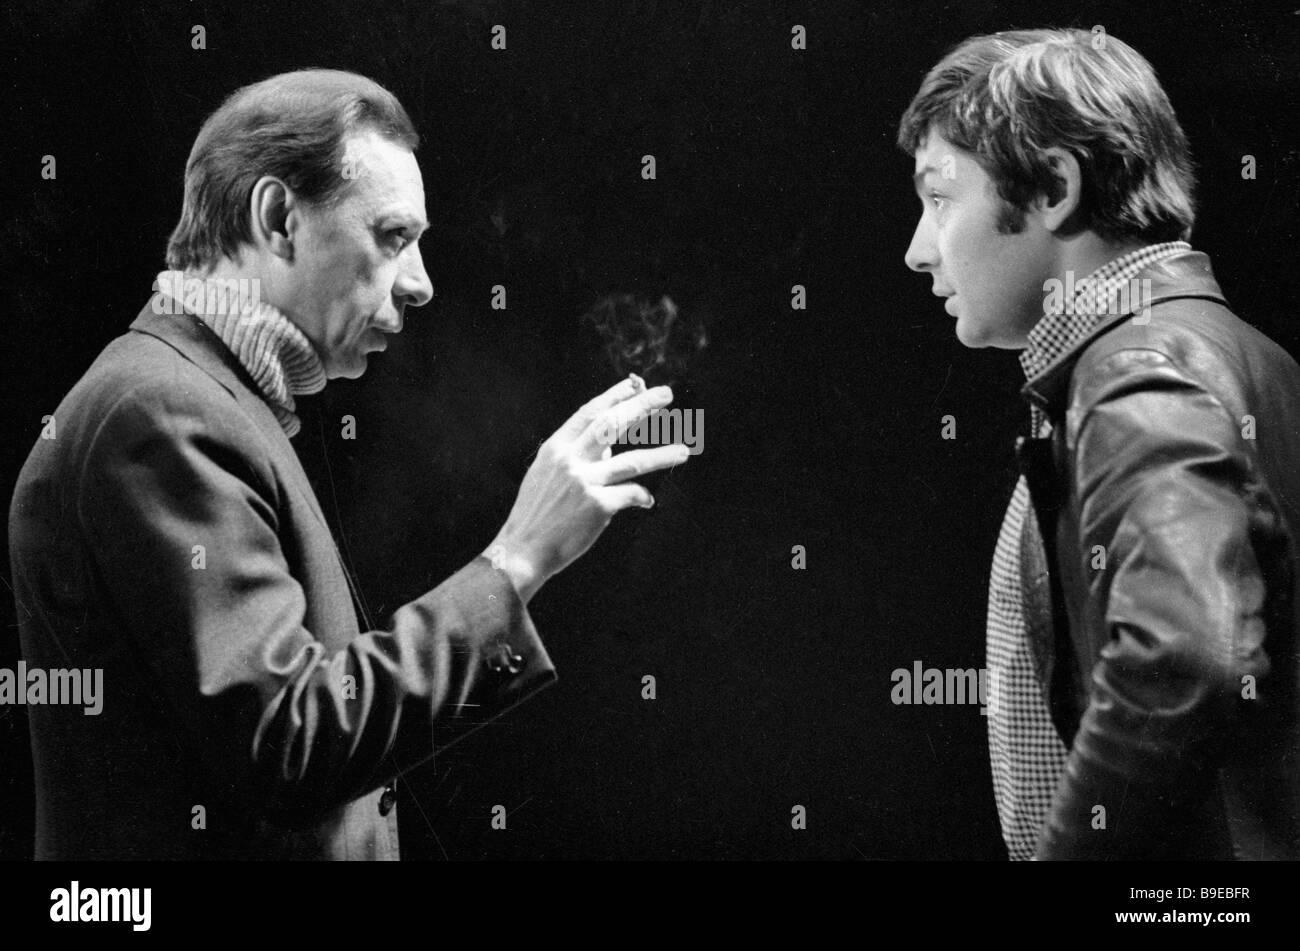 The MKhAT Theater chief producer Oleg Yefremov left and actor Vsevolod Abdulov right rehearsing - Stock Image